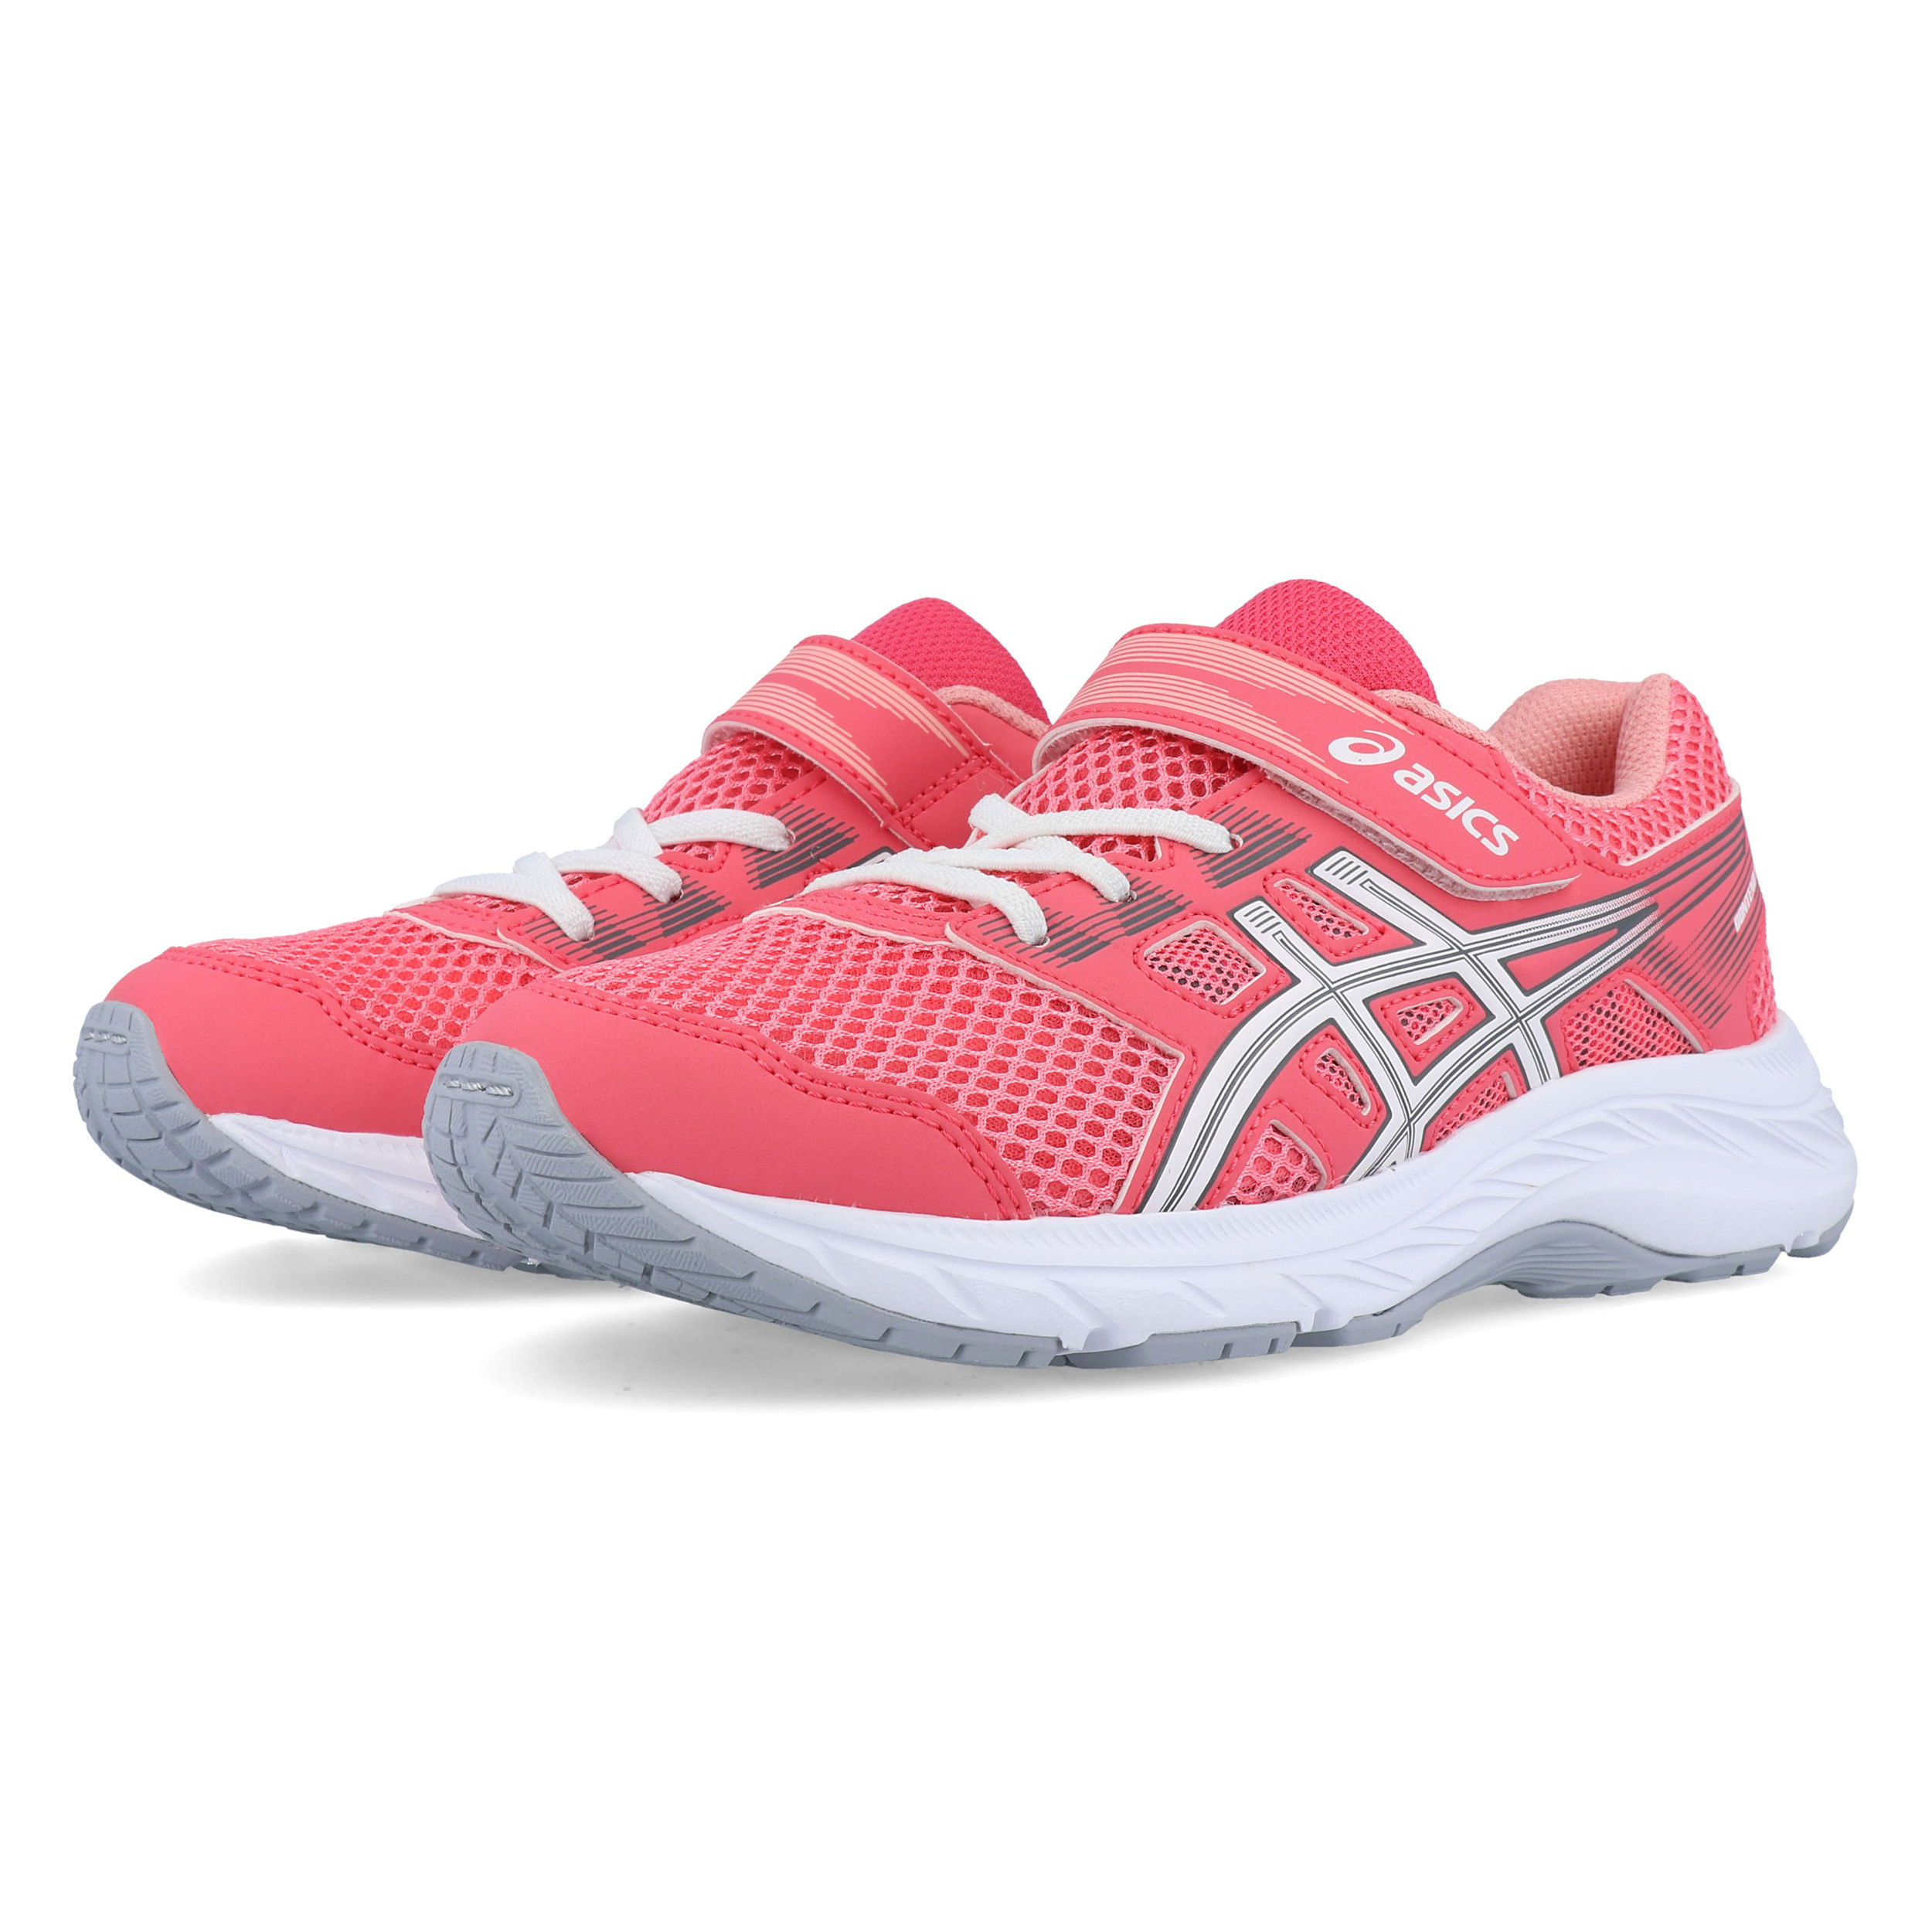 asics gel-contend 5 ps junior running shoes uomo